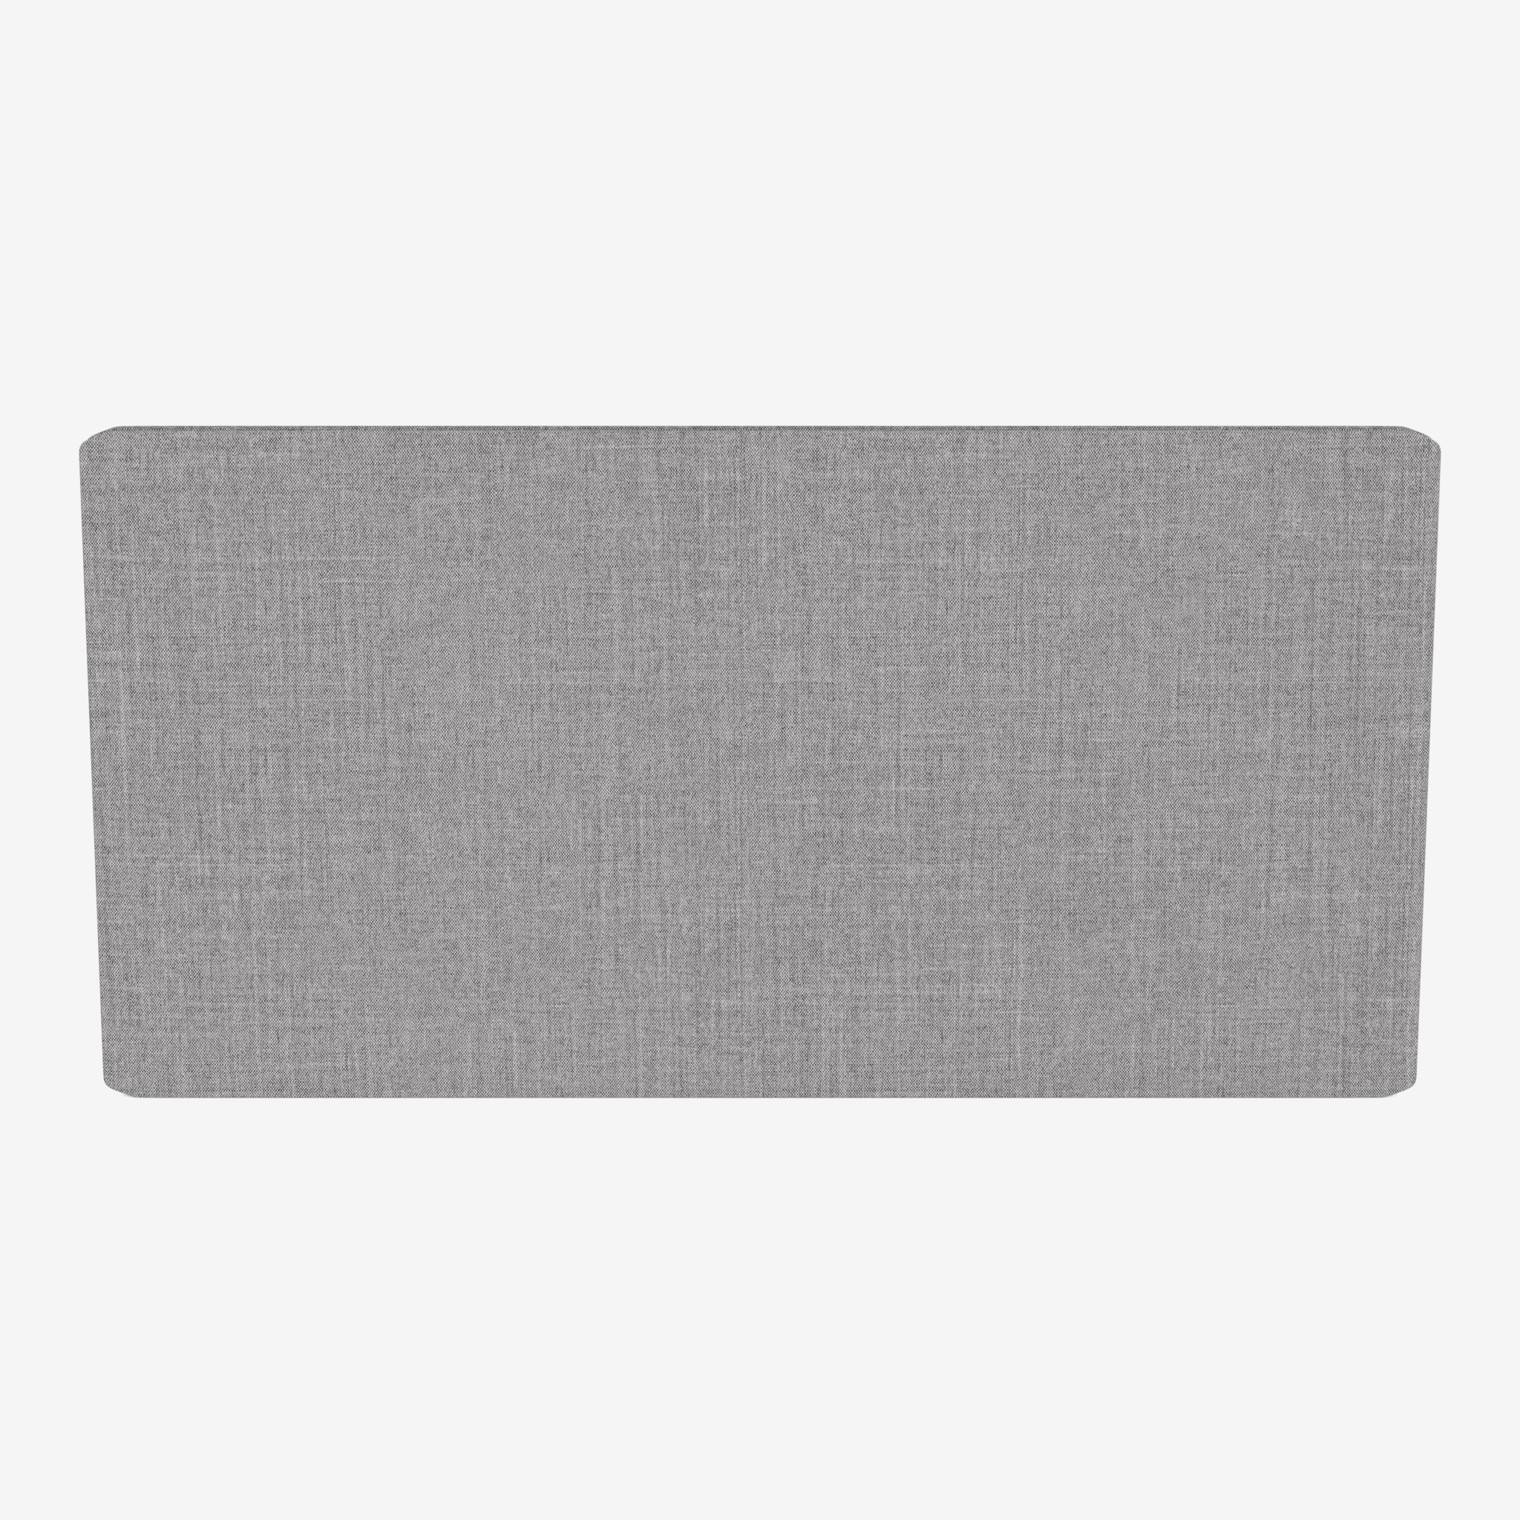 Montana Free acoustic textile panels